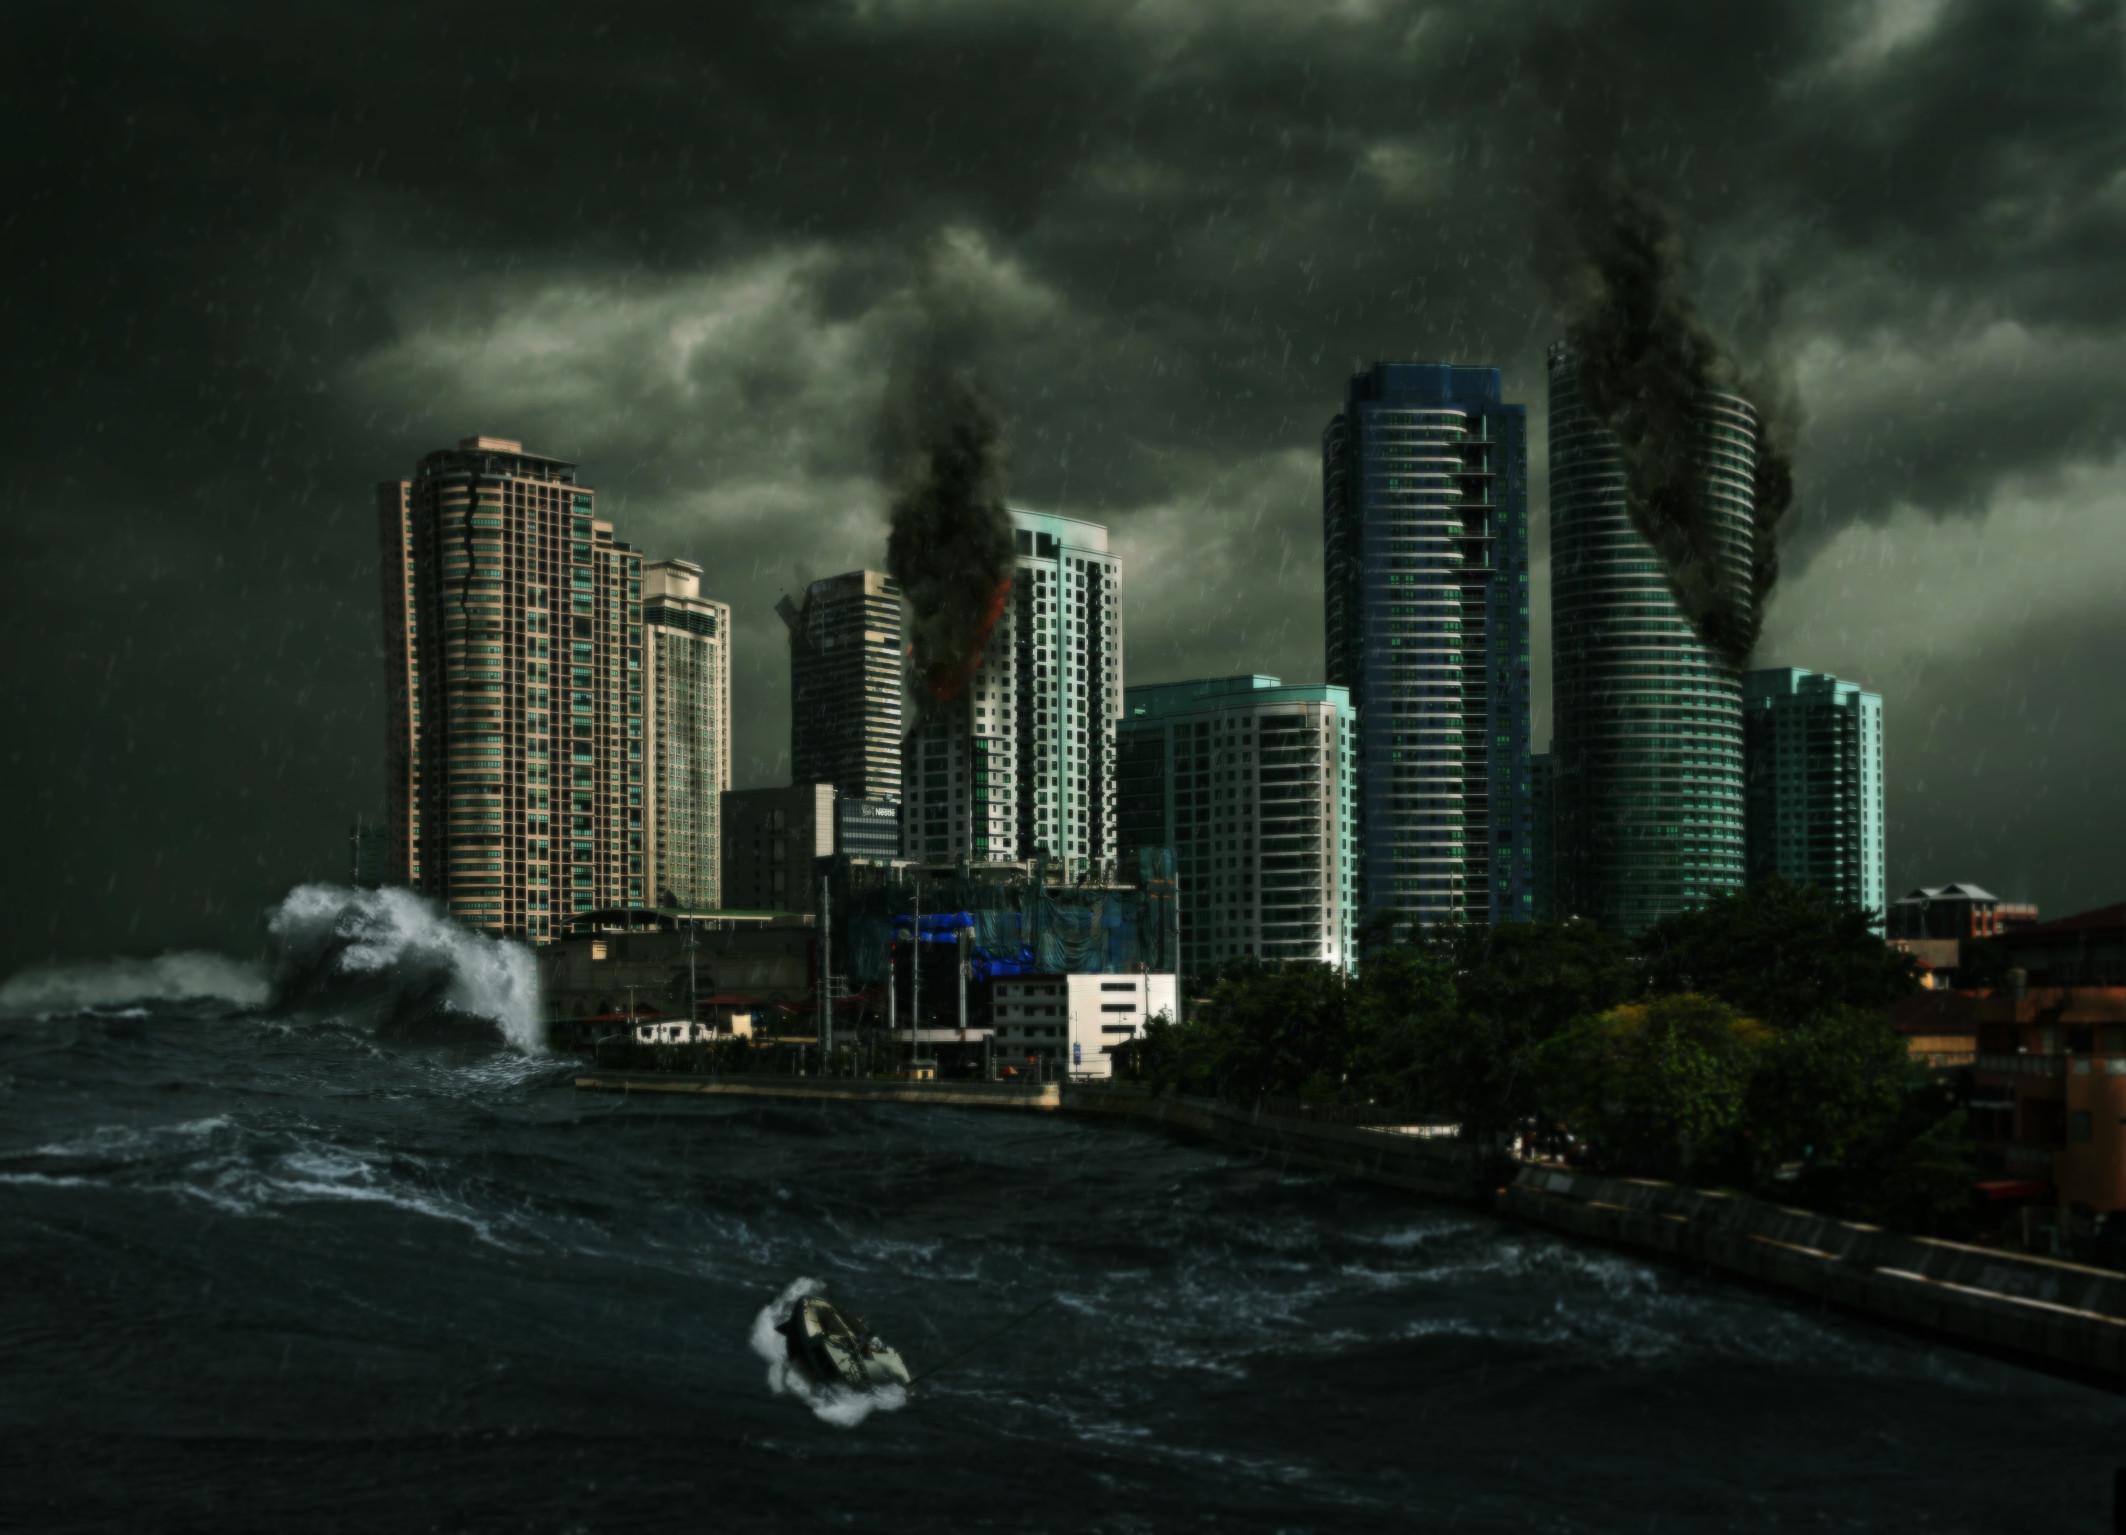 Destroyed City by Mequ Destroyed City by Mequ